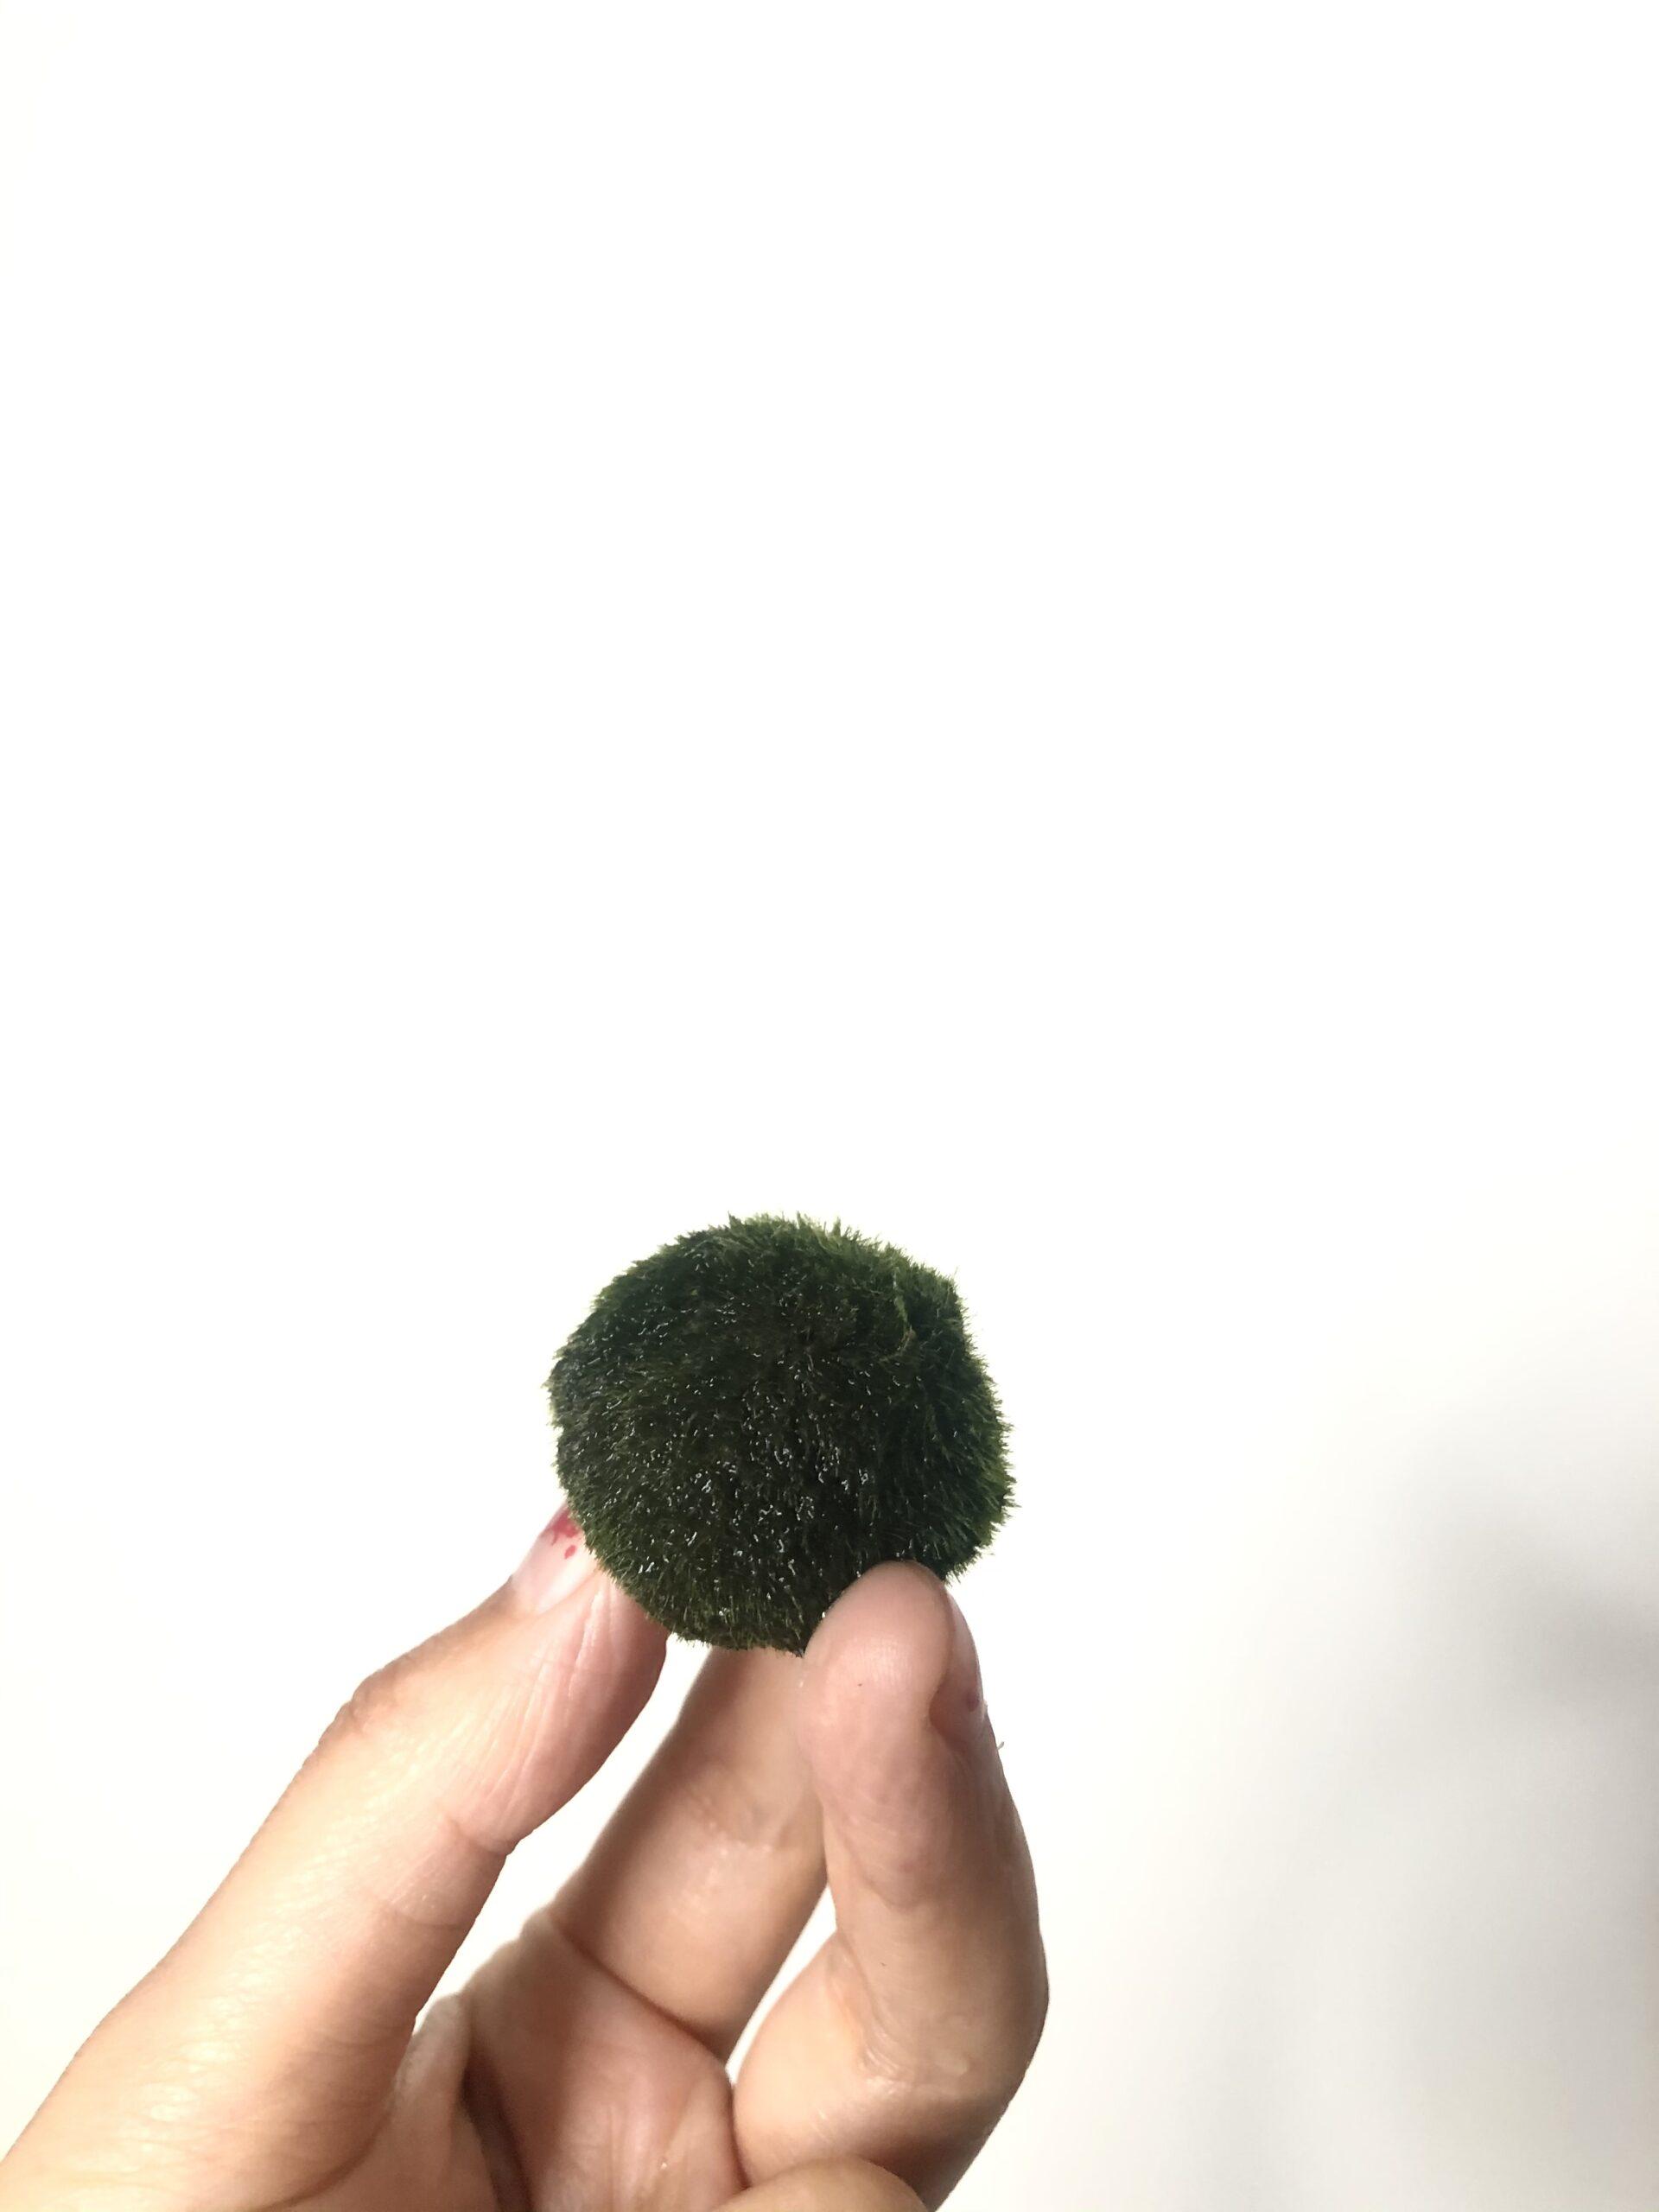 indoor plant marimo moss ball